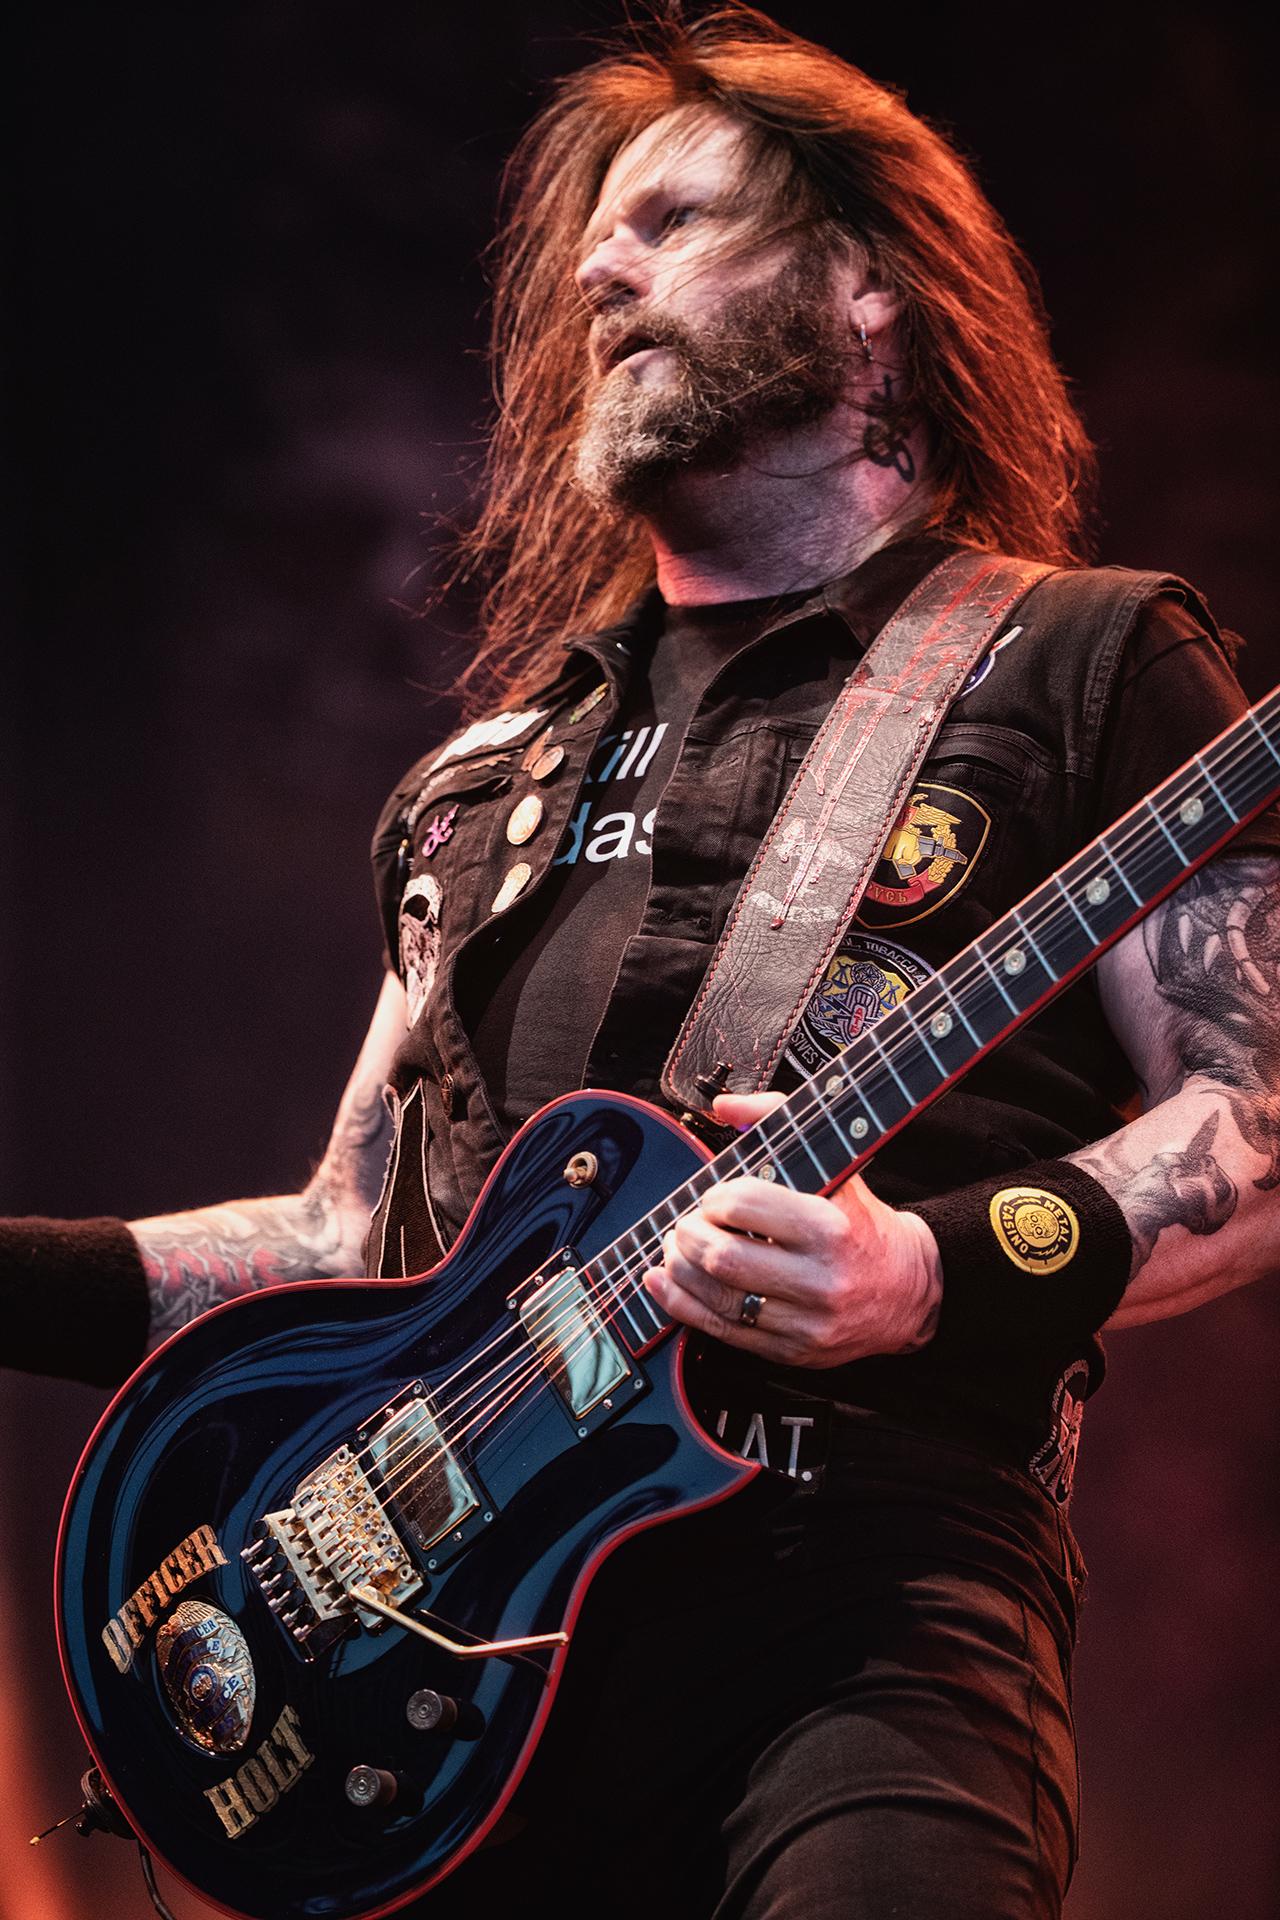 Gary Holt, Slayer band guitarist, Tuska metal festival